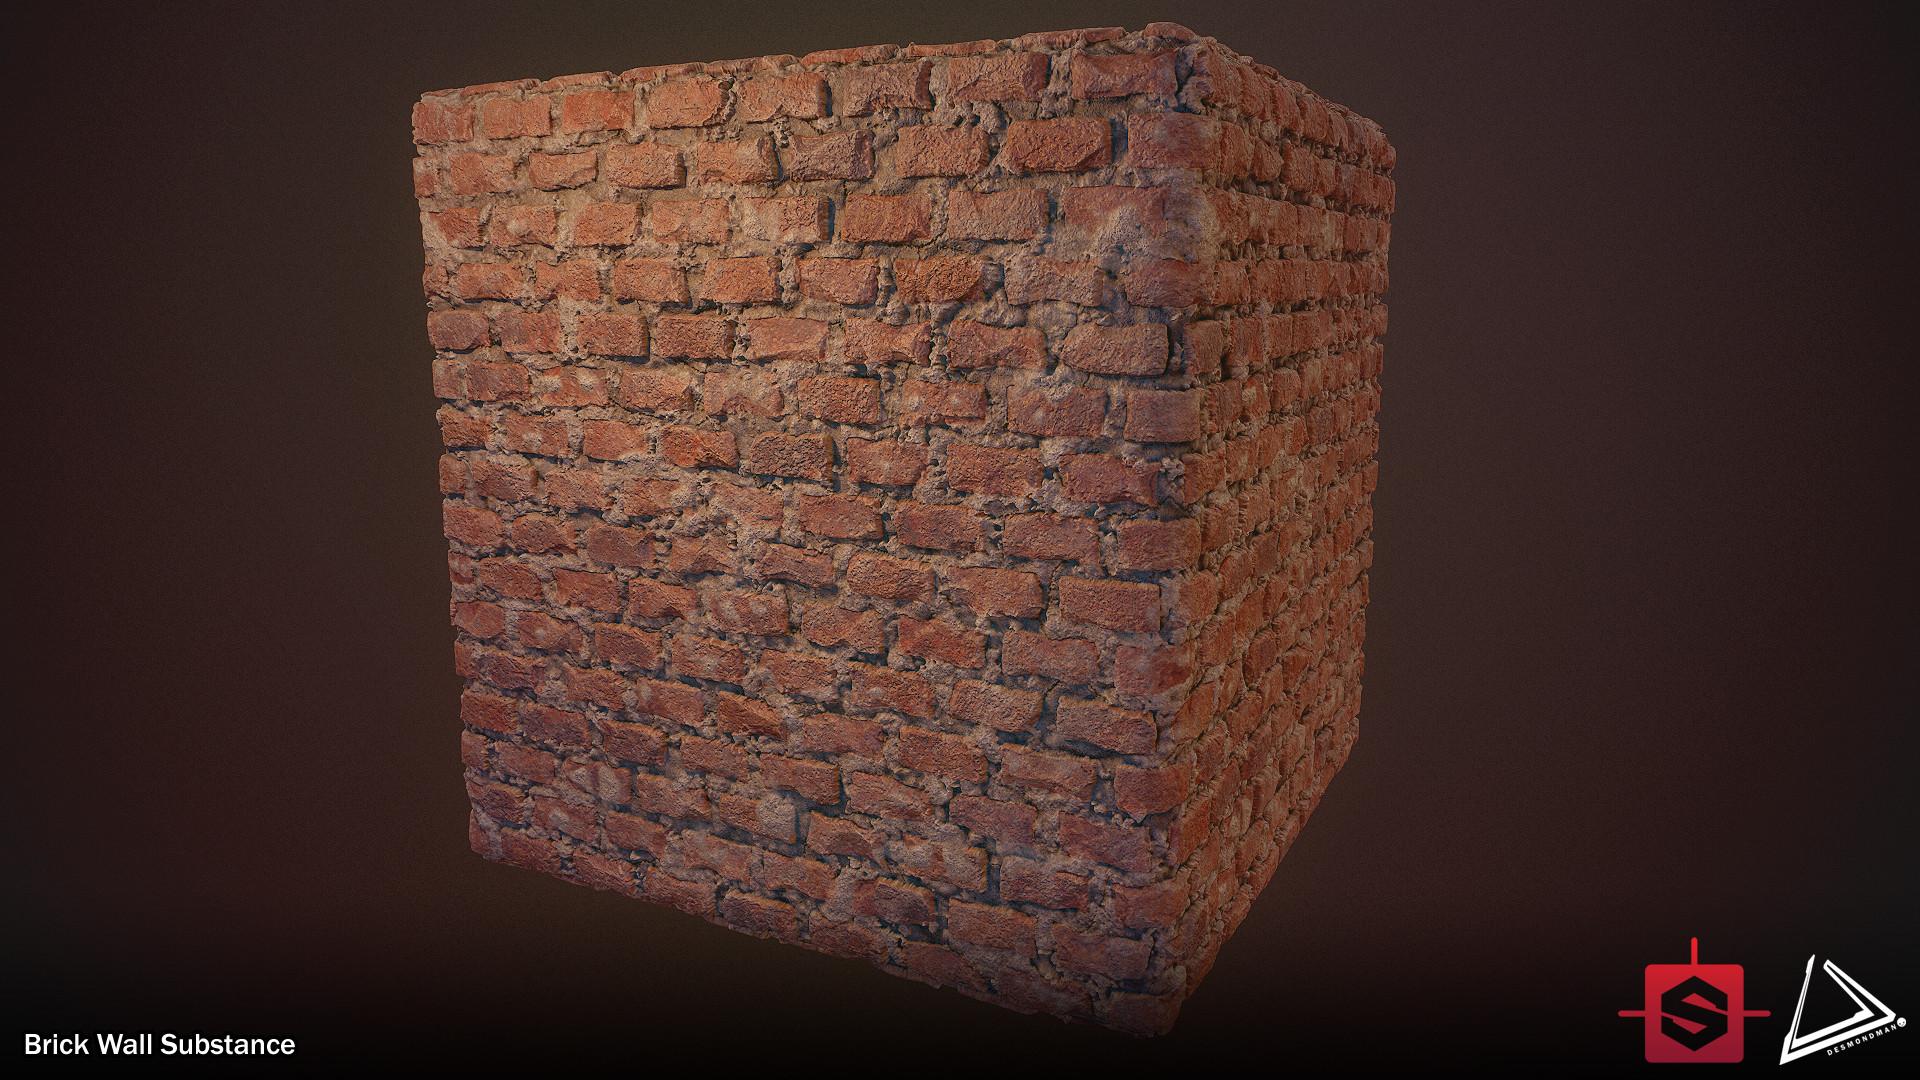 Desmond man sbwc brickwall01 showcase01